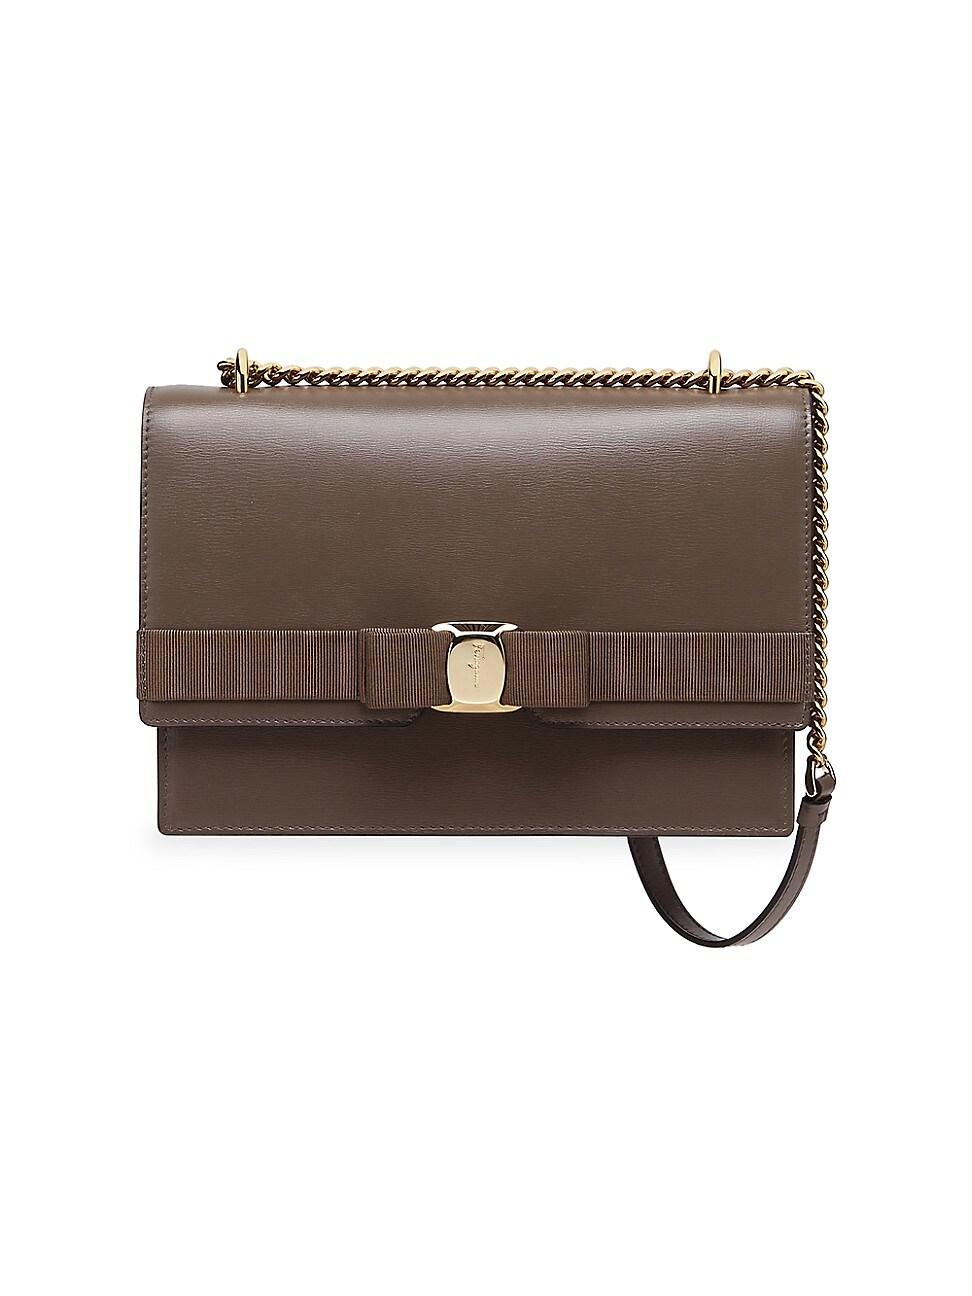 Salvatore Ferragamo Women's Vara Leather Shoulder Bag In Charcoal